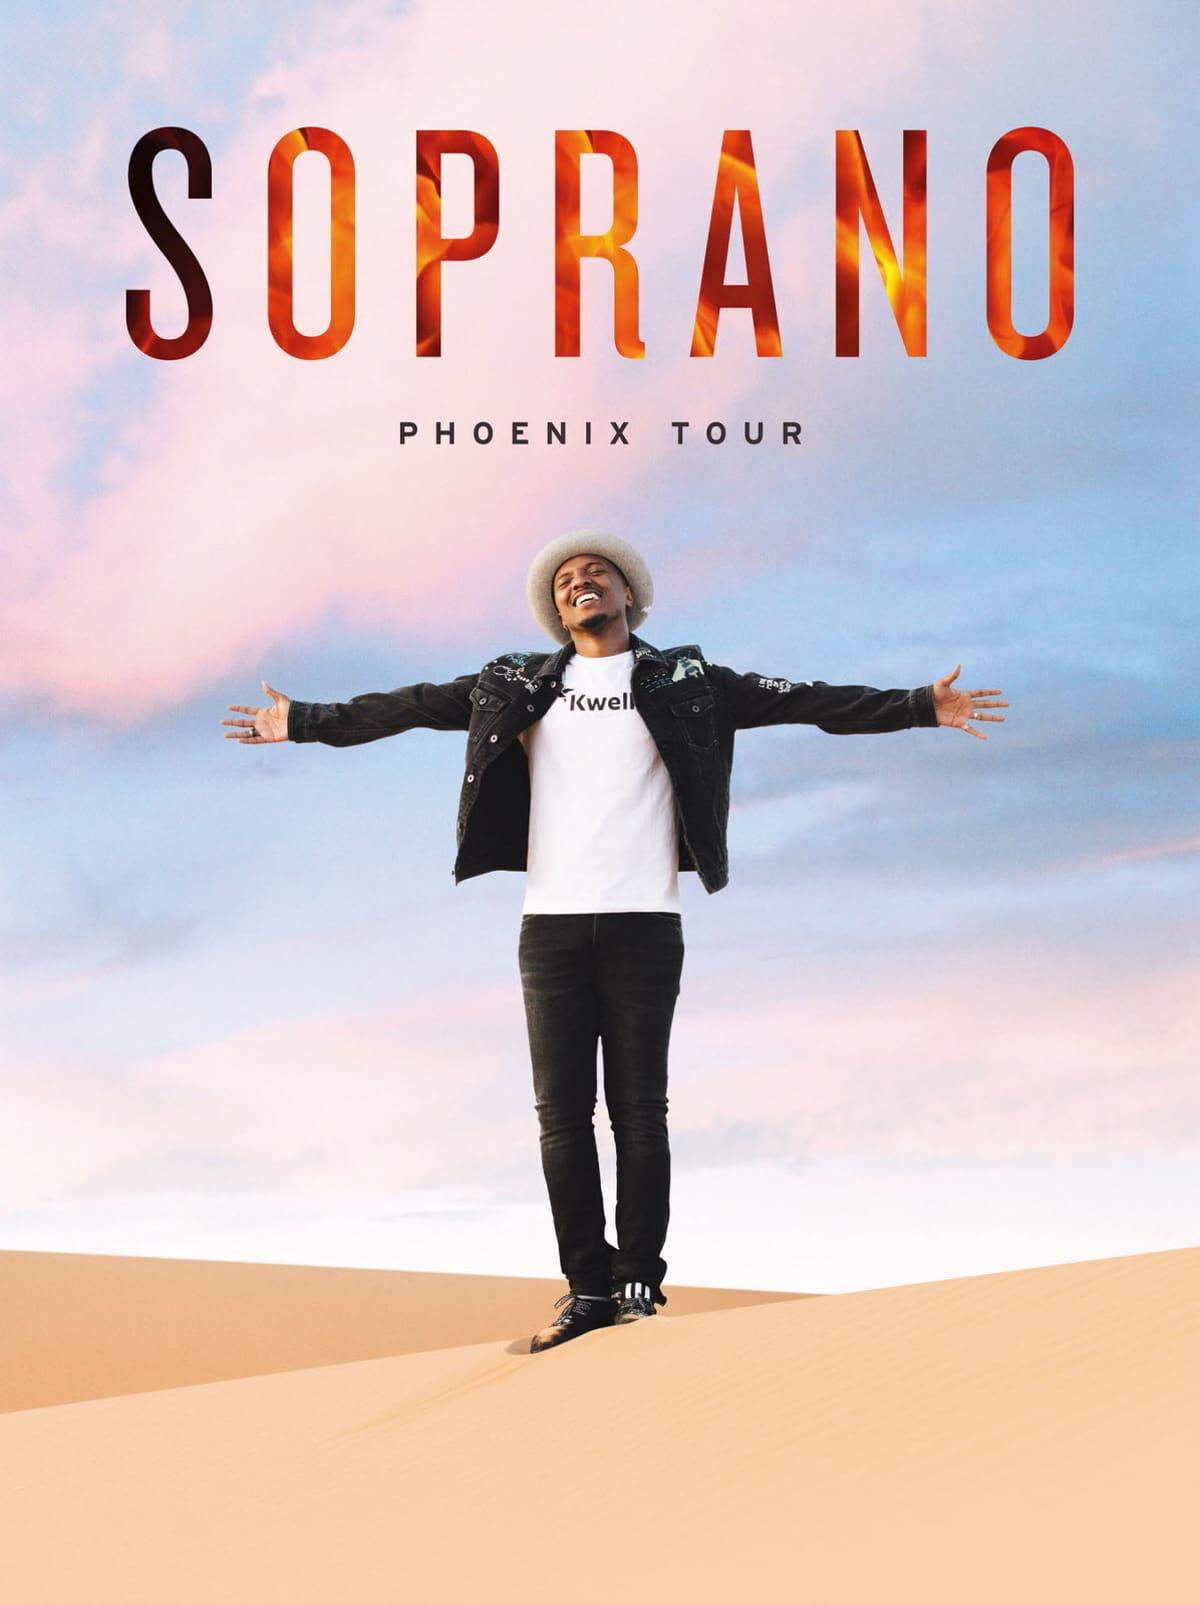 Soprano - Pheonix Tour